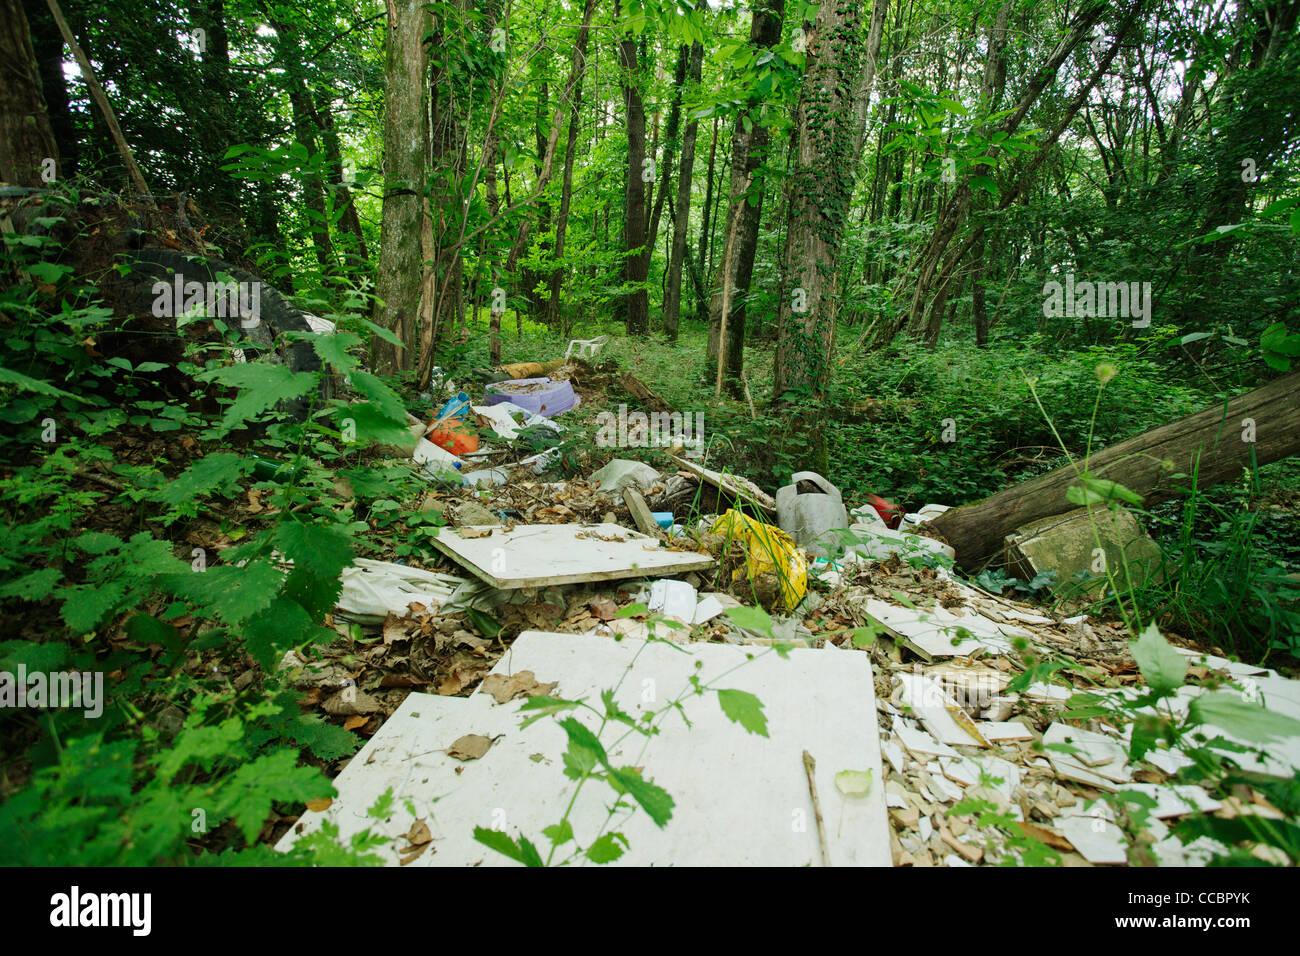 Müll in den Wald geworfen Stockbild